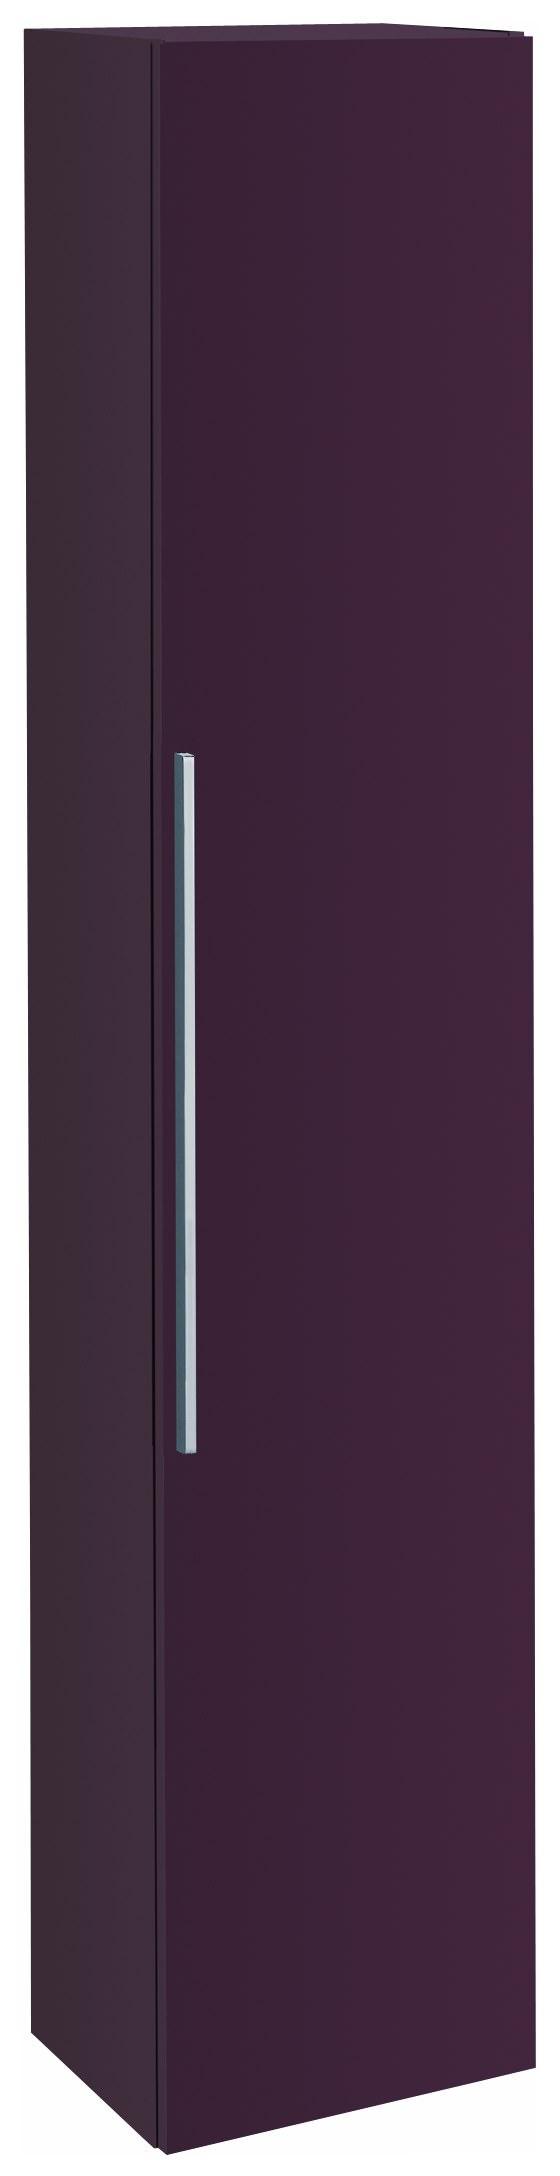 keramag icon hochschrank 360mm x 1800mm x 309mm alpin hochglanz 840000000. Black Bedroom Furniture Sets. Home Design Ideas